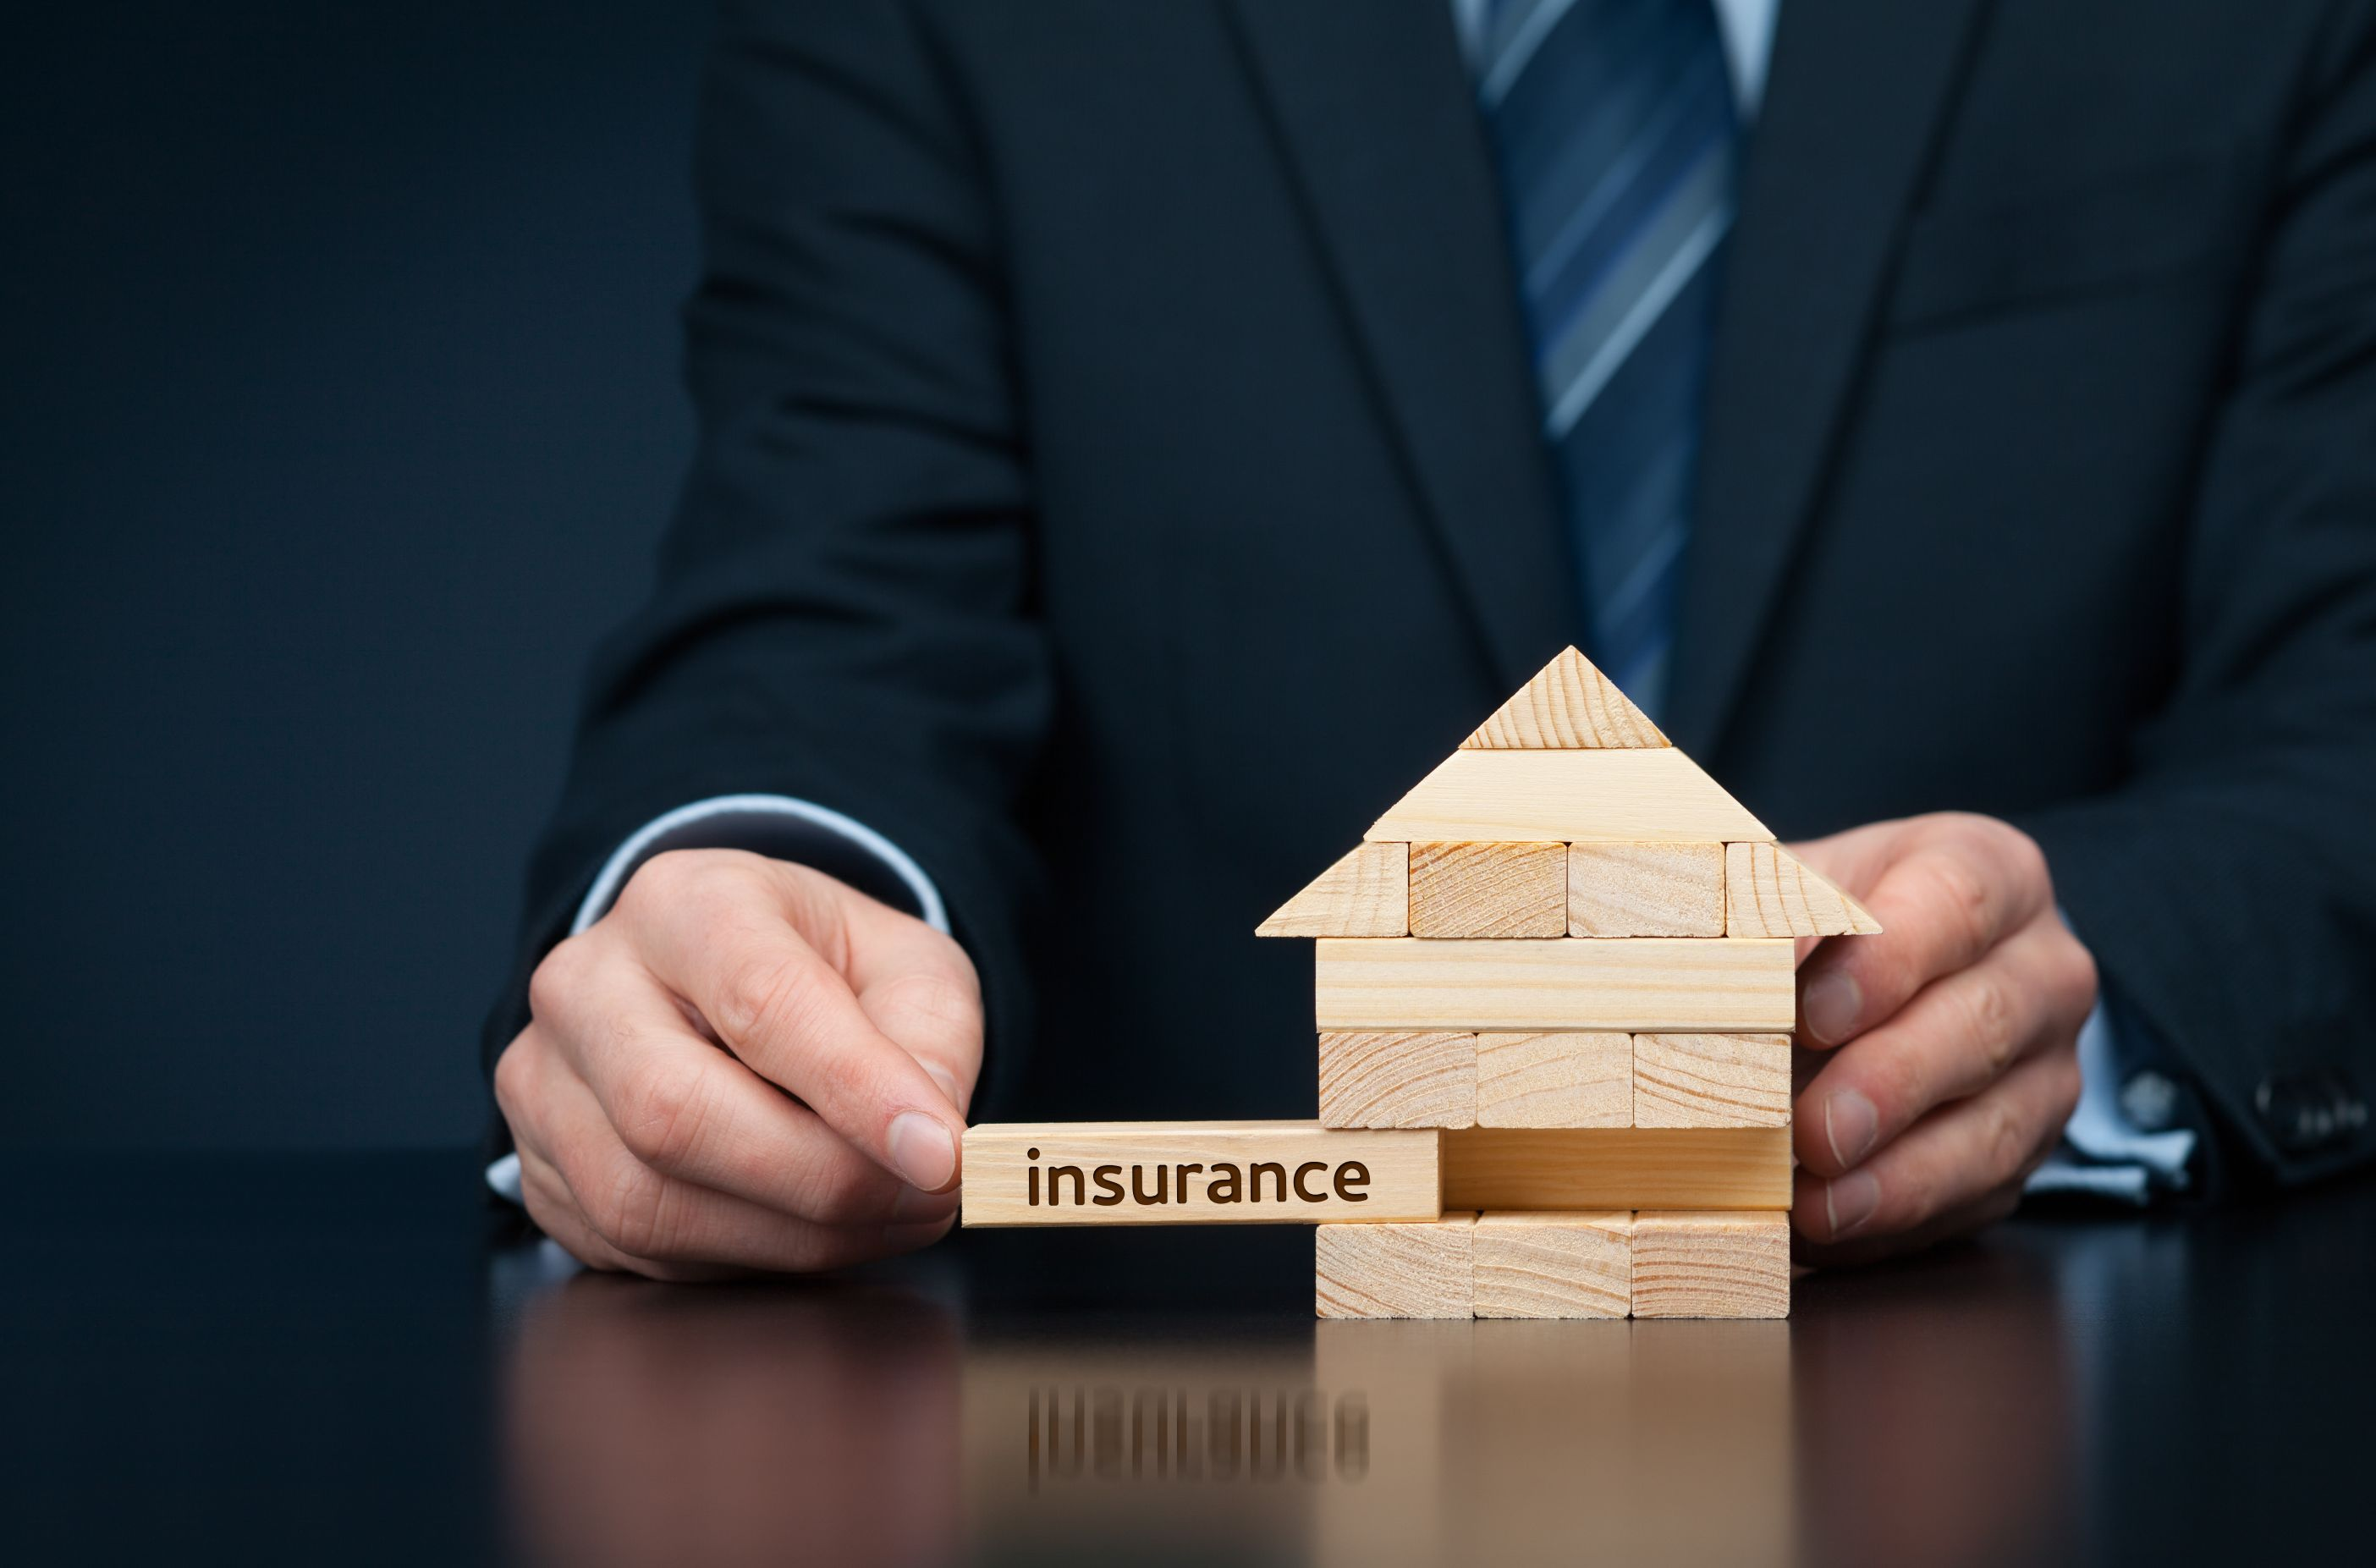 best-insurance-property-council-bluffs-ia-usa